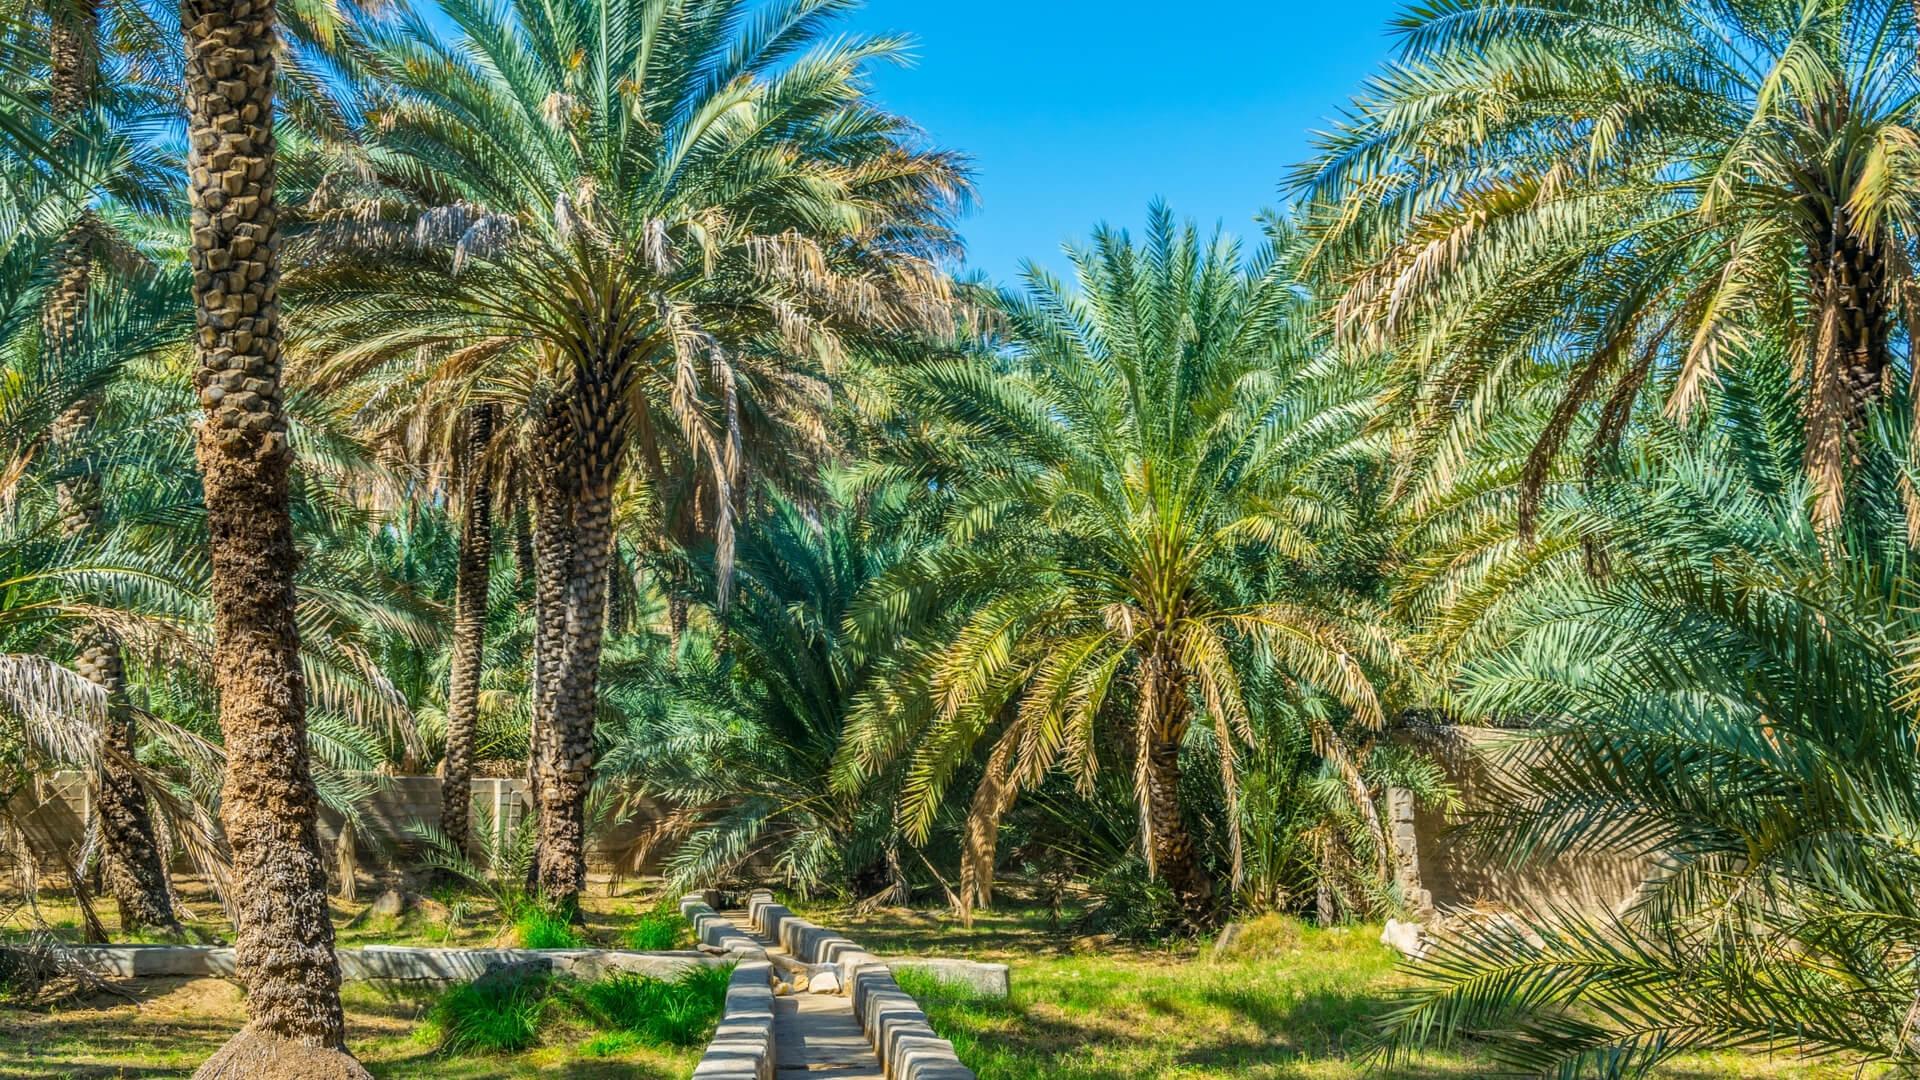 Al Ain Palms